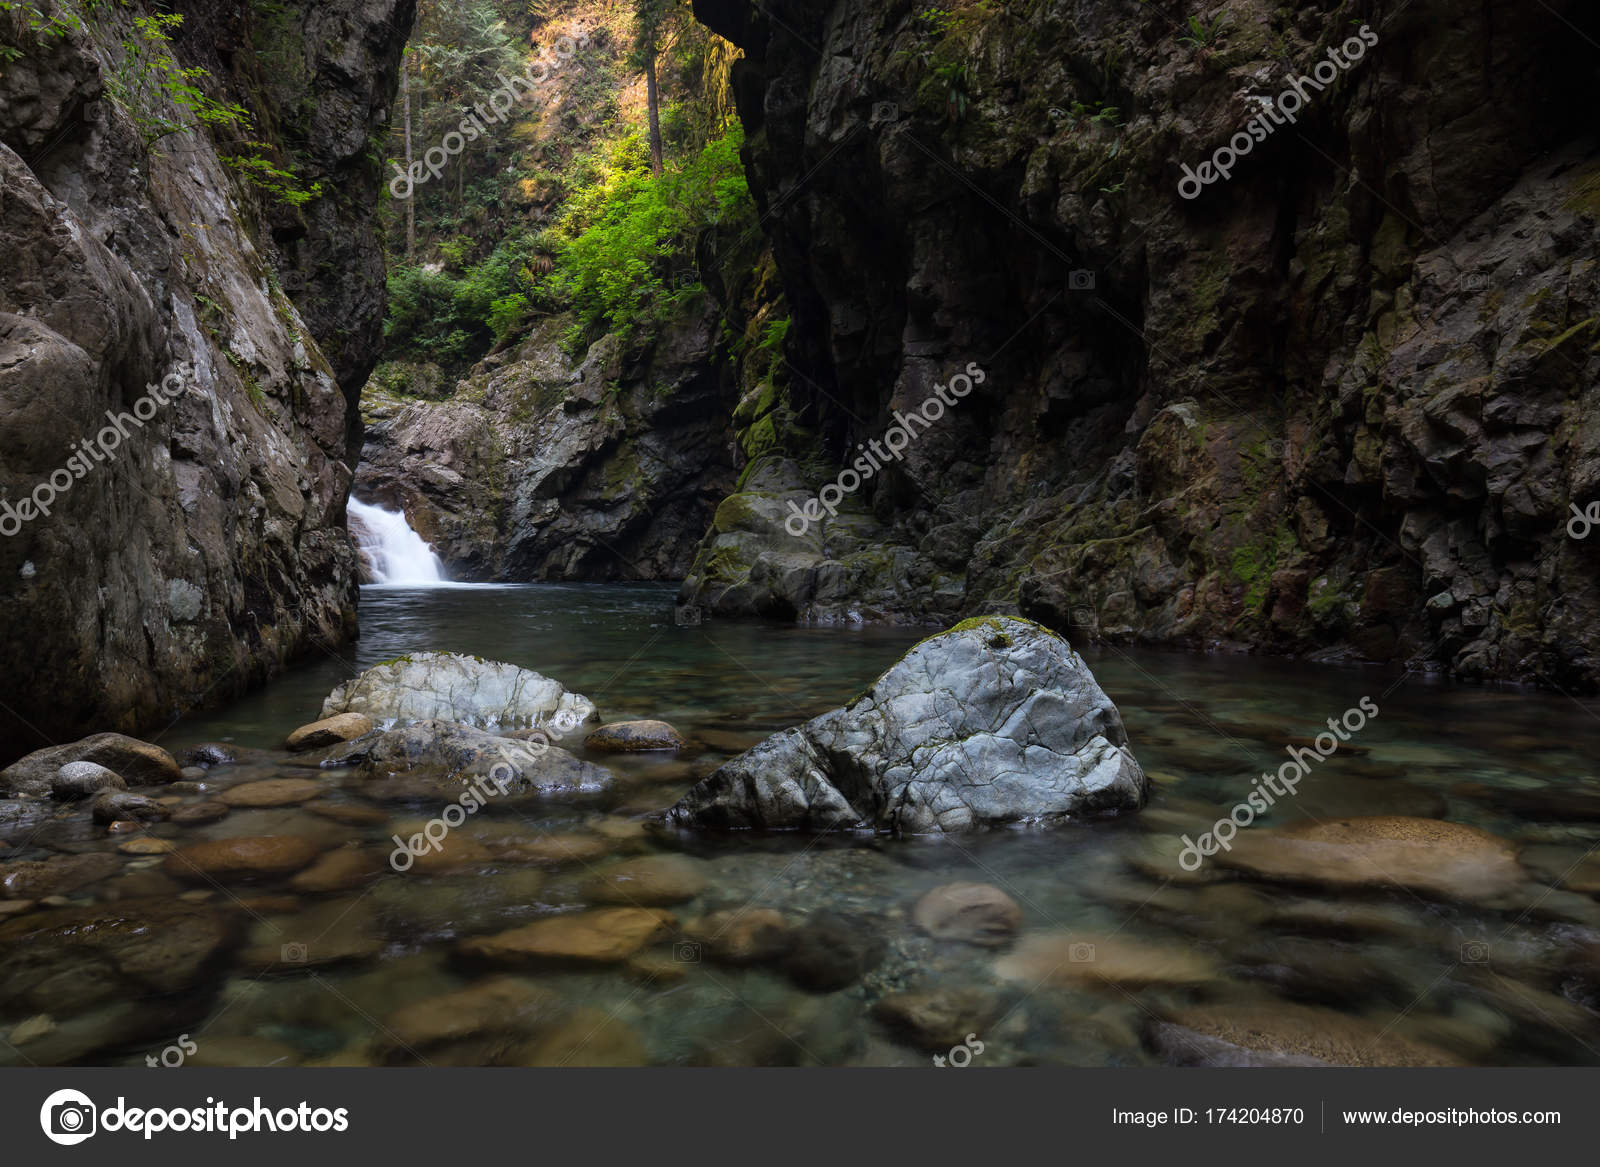 river flowing smooth rocks taken shannon falls squamish british